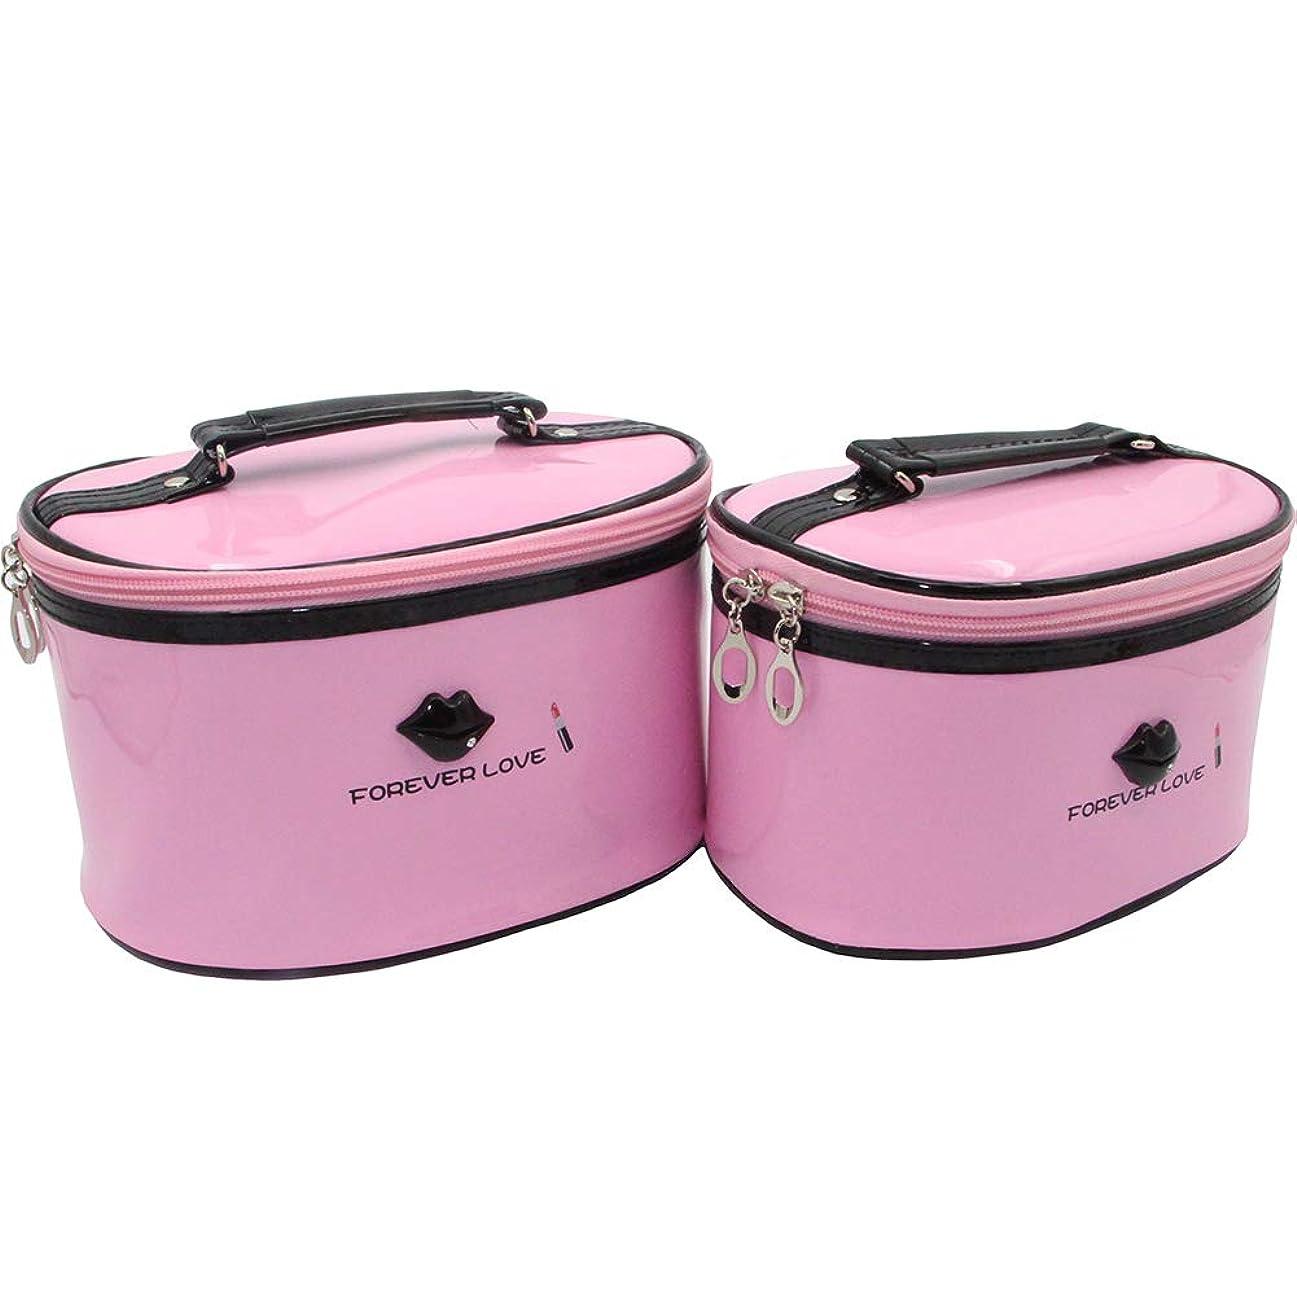 HOYOFO 化粧ポーチ メイクボックス 大容量 おしゃれ バニティ エナメル 化粧品 コスメ収納 ブラシ入れ 防水 旅行 2点セット ピンク